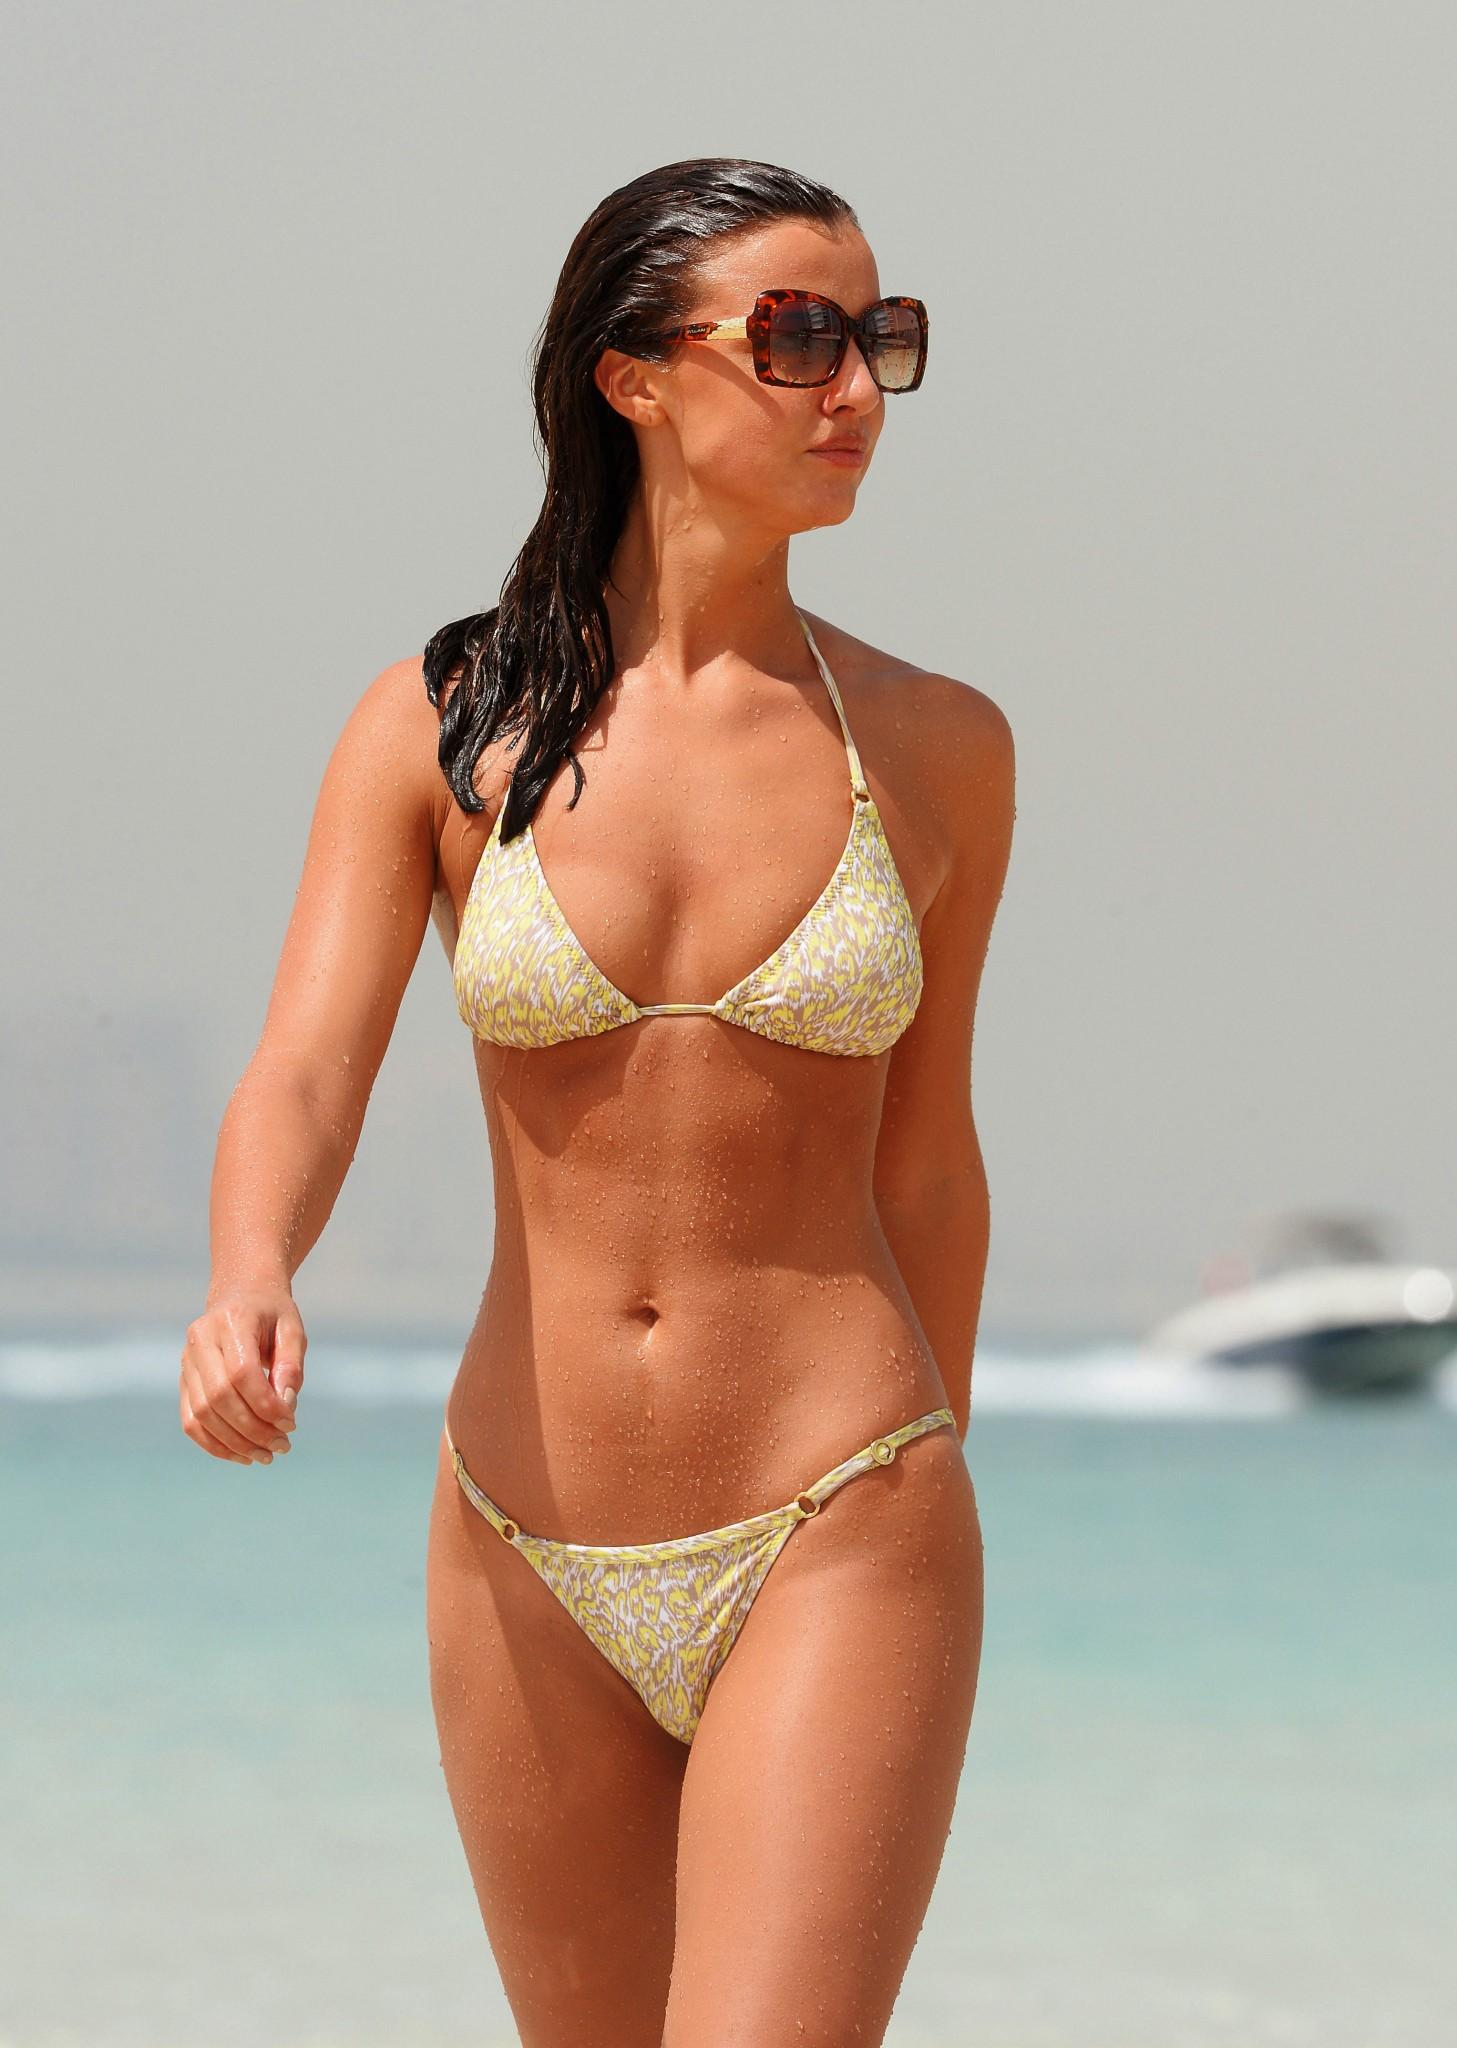 lucy-mecklenburgh-wearing-a-bikini-in-dubai-01